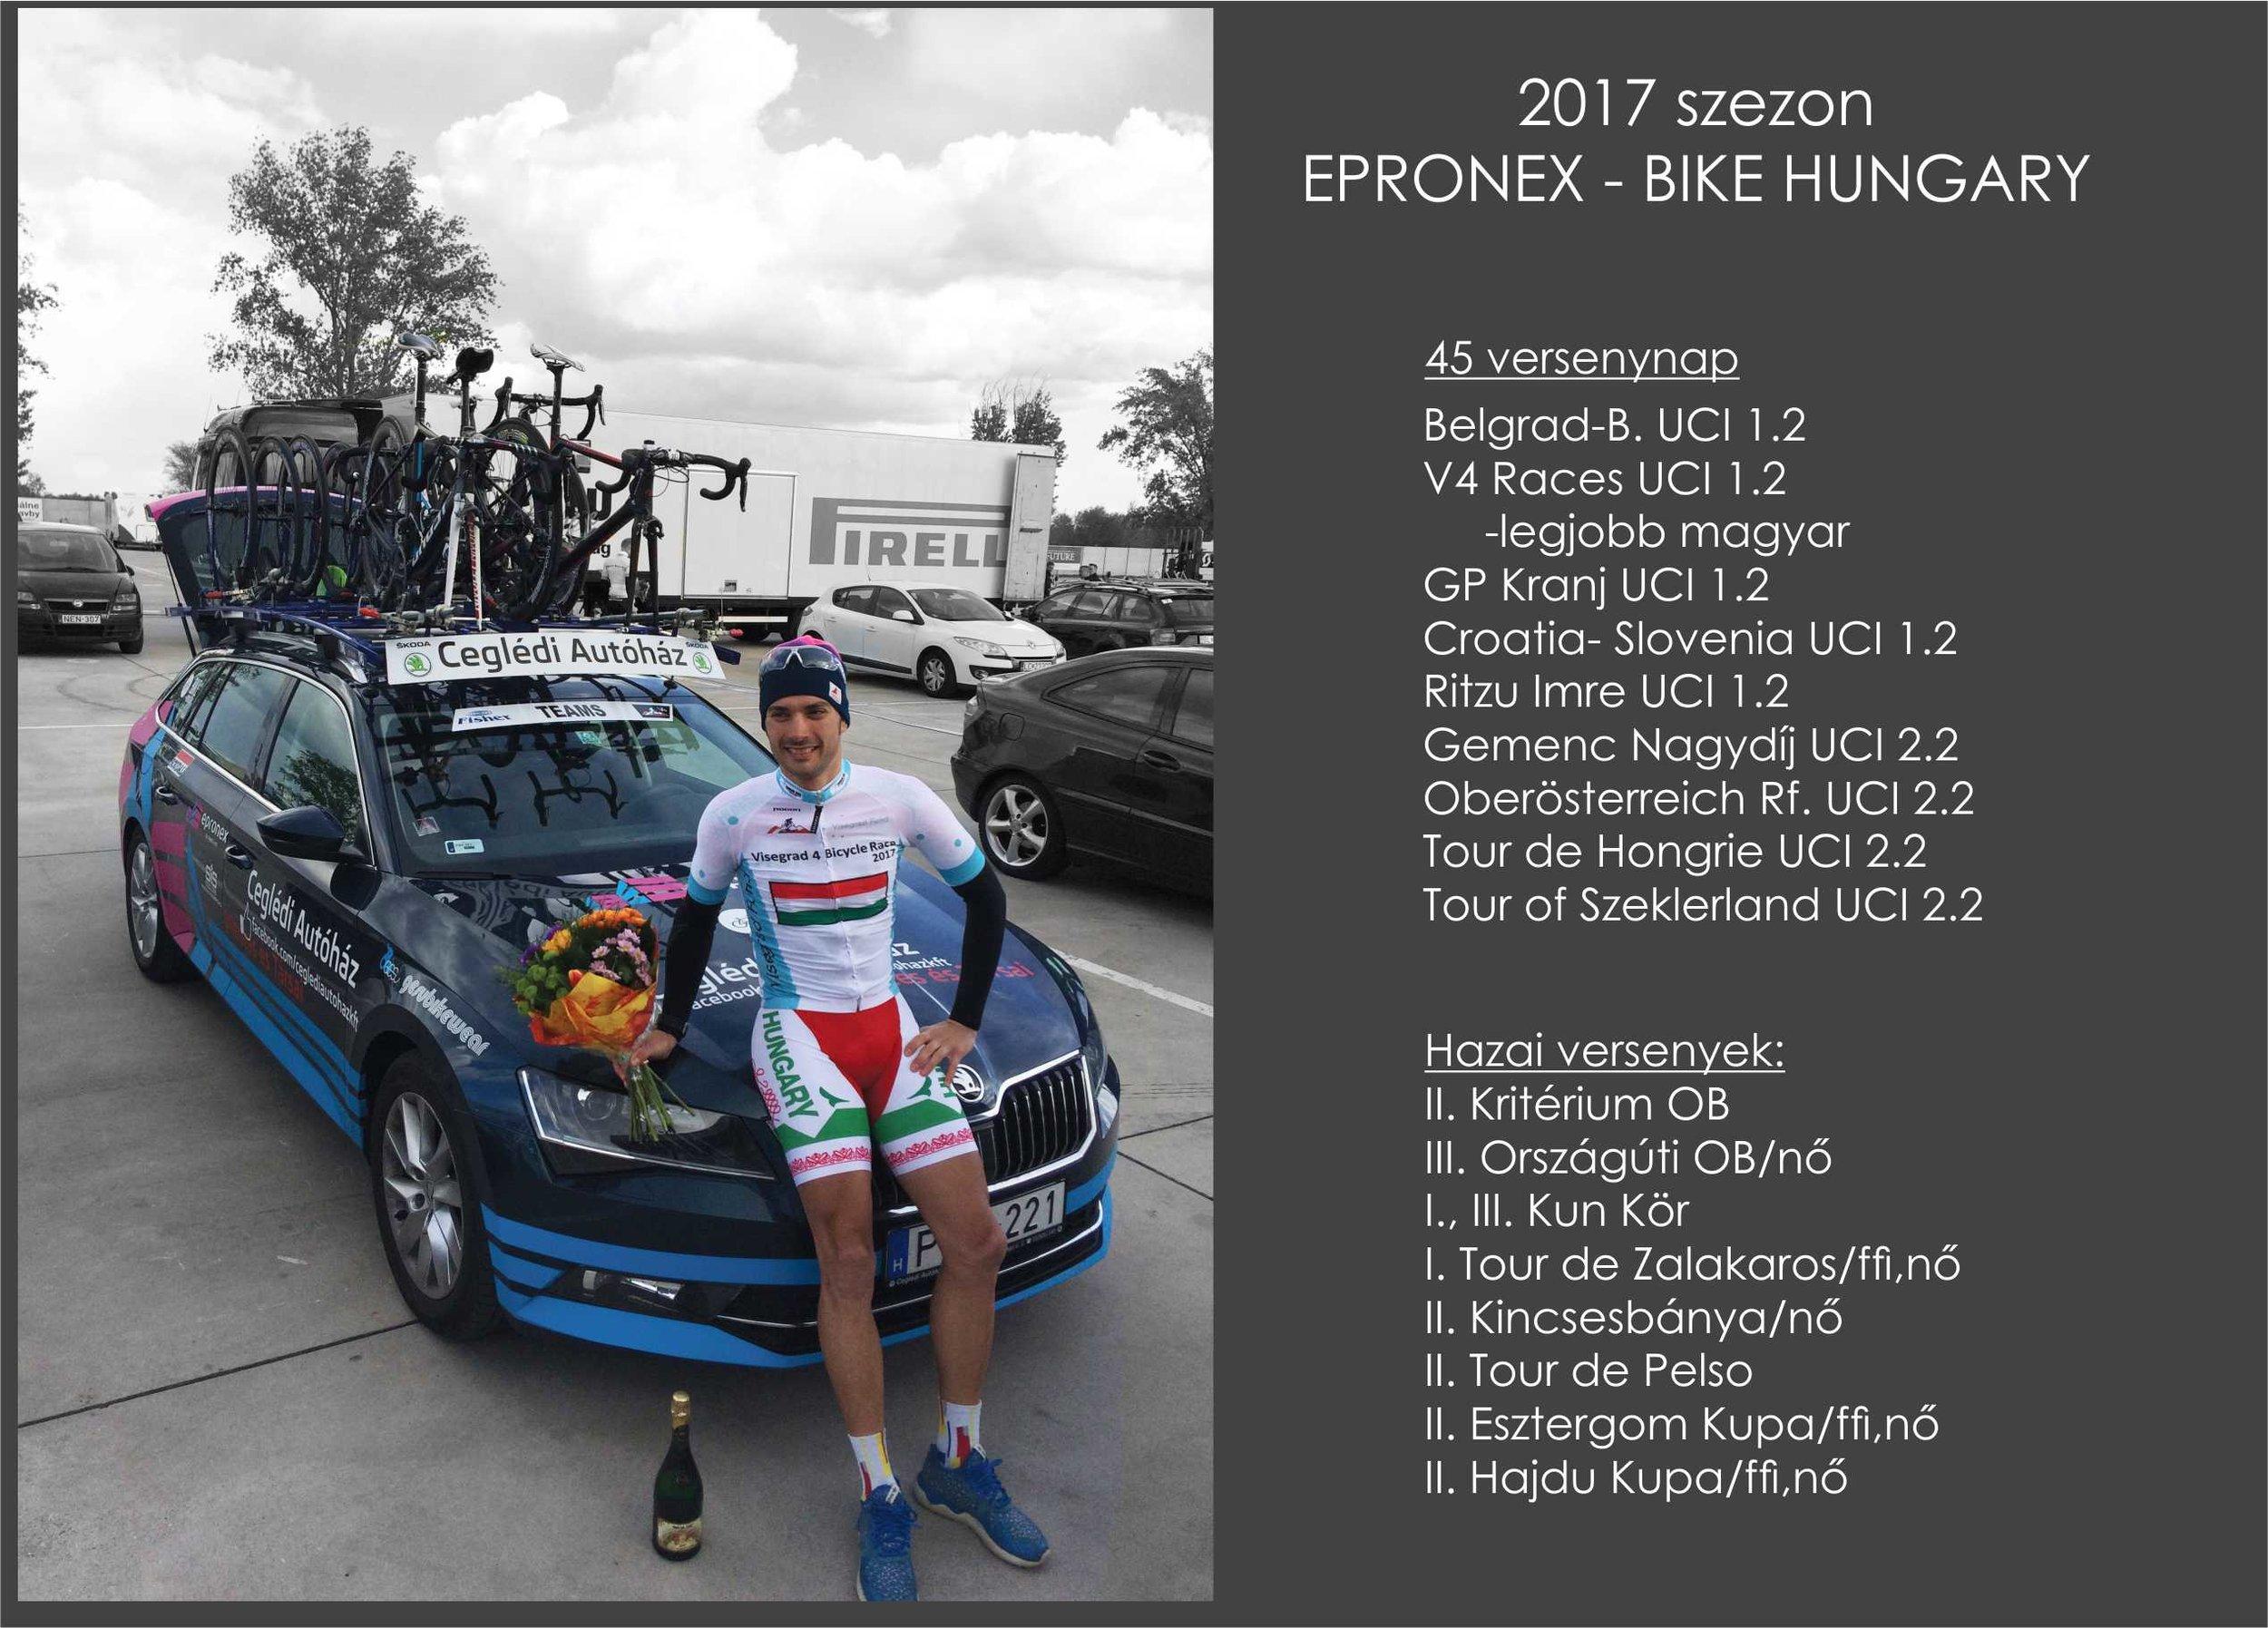 epronex 2017.jpg